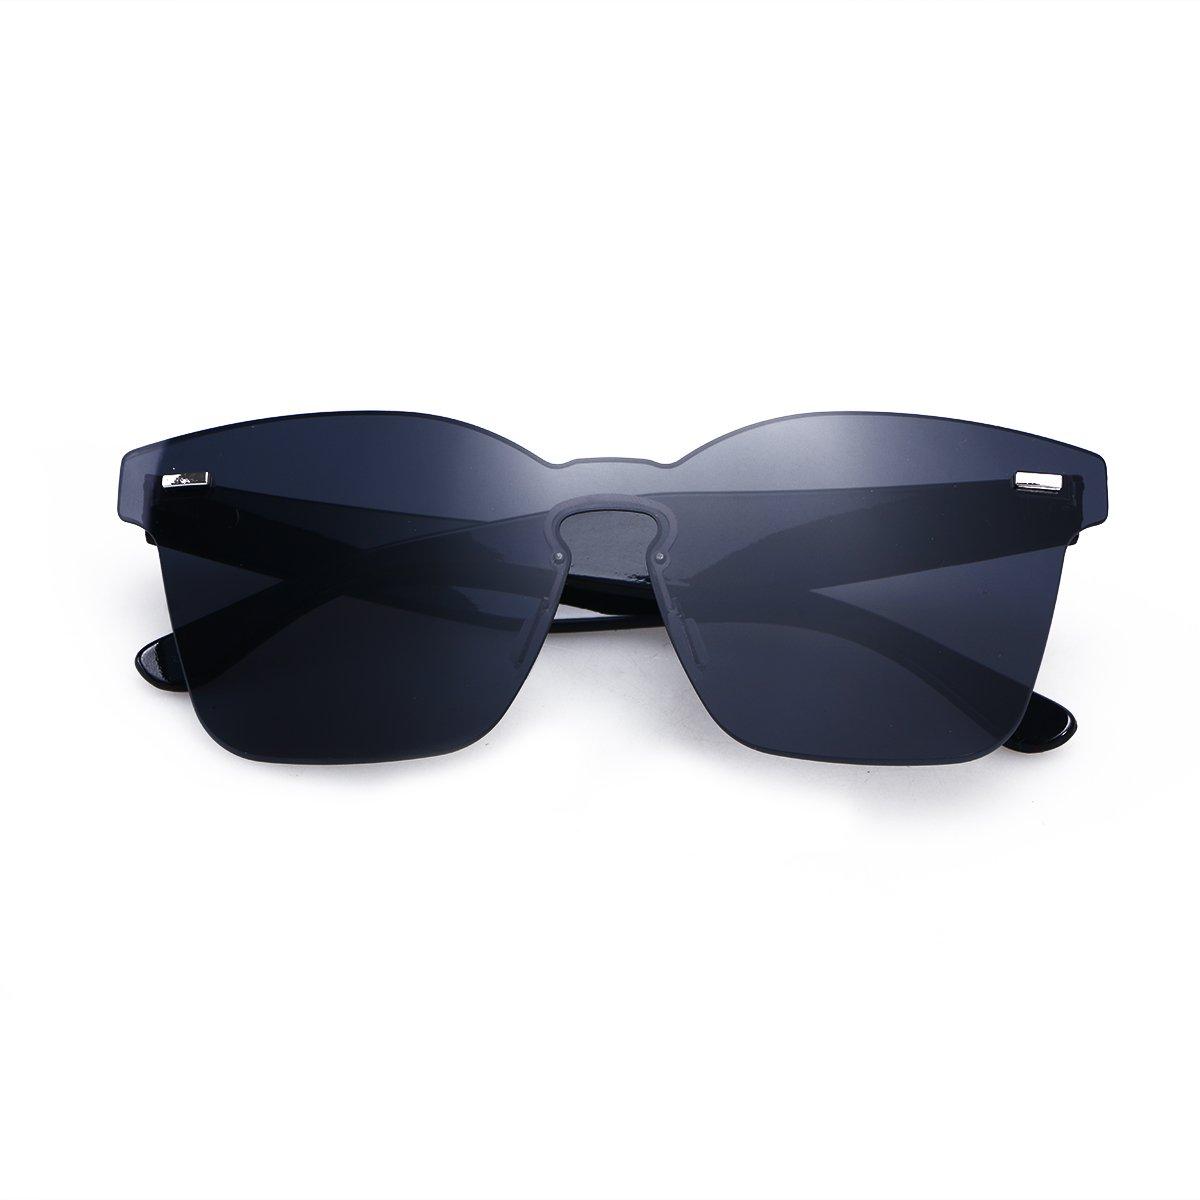 47f0699fd17c OULII Rimless Sunglasses Novelty Pratical Beach Seaside Sunglass Mirror  Summer Eyewear for Men Women (Black) at Amazon Women's Clothing store: